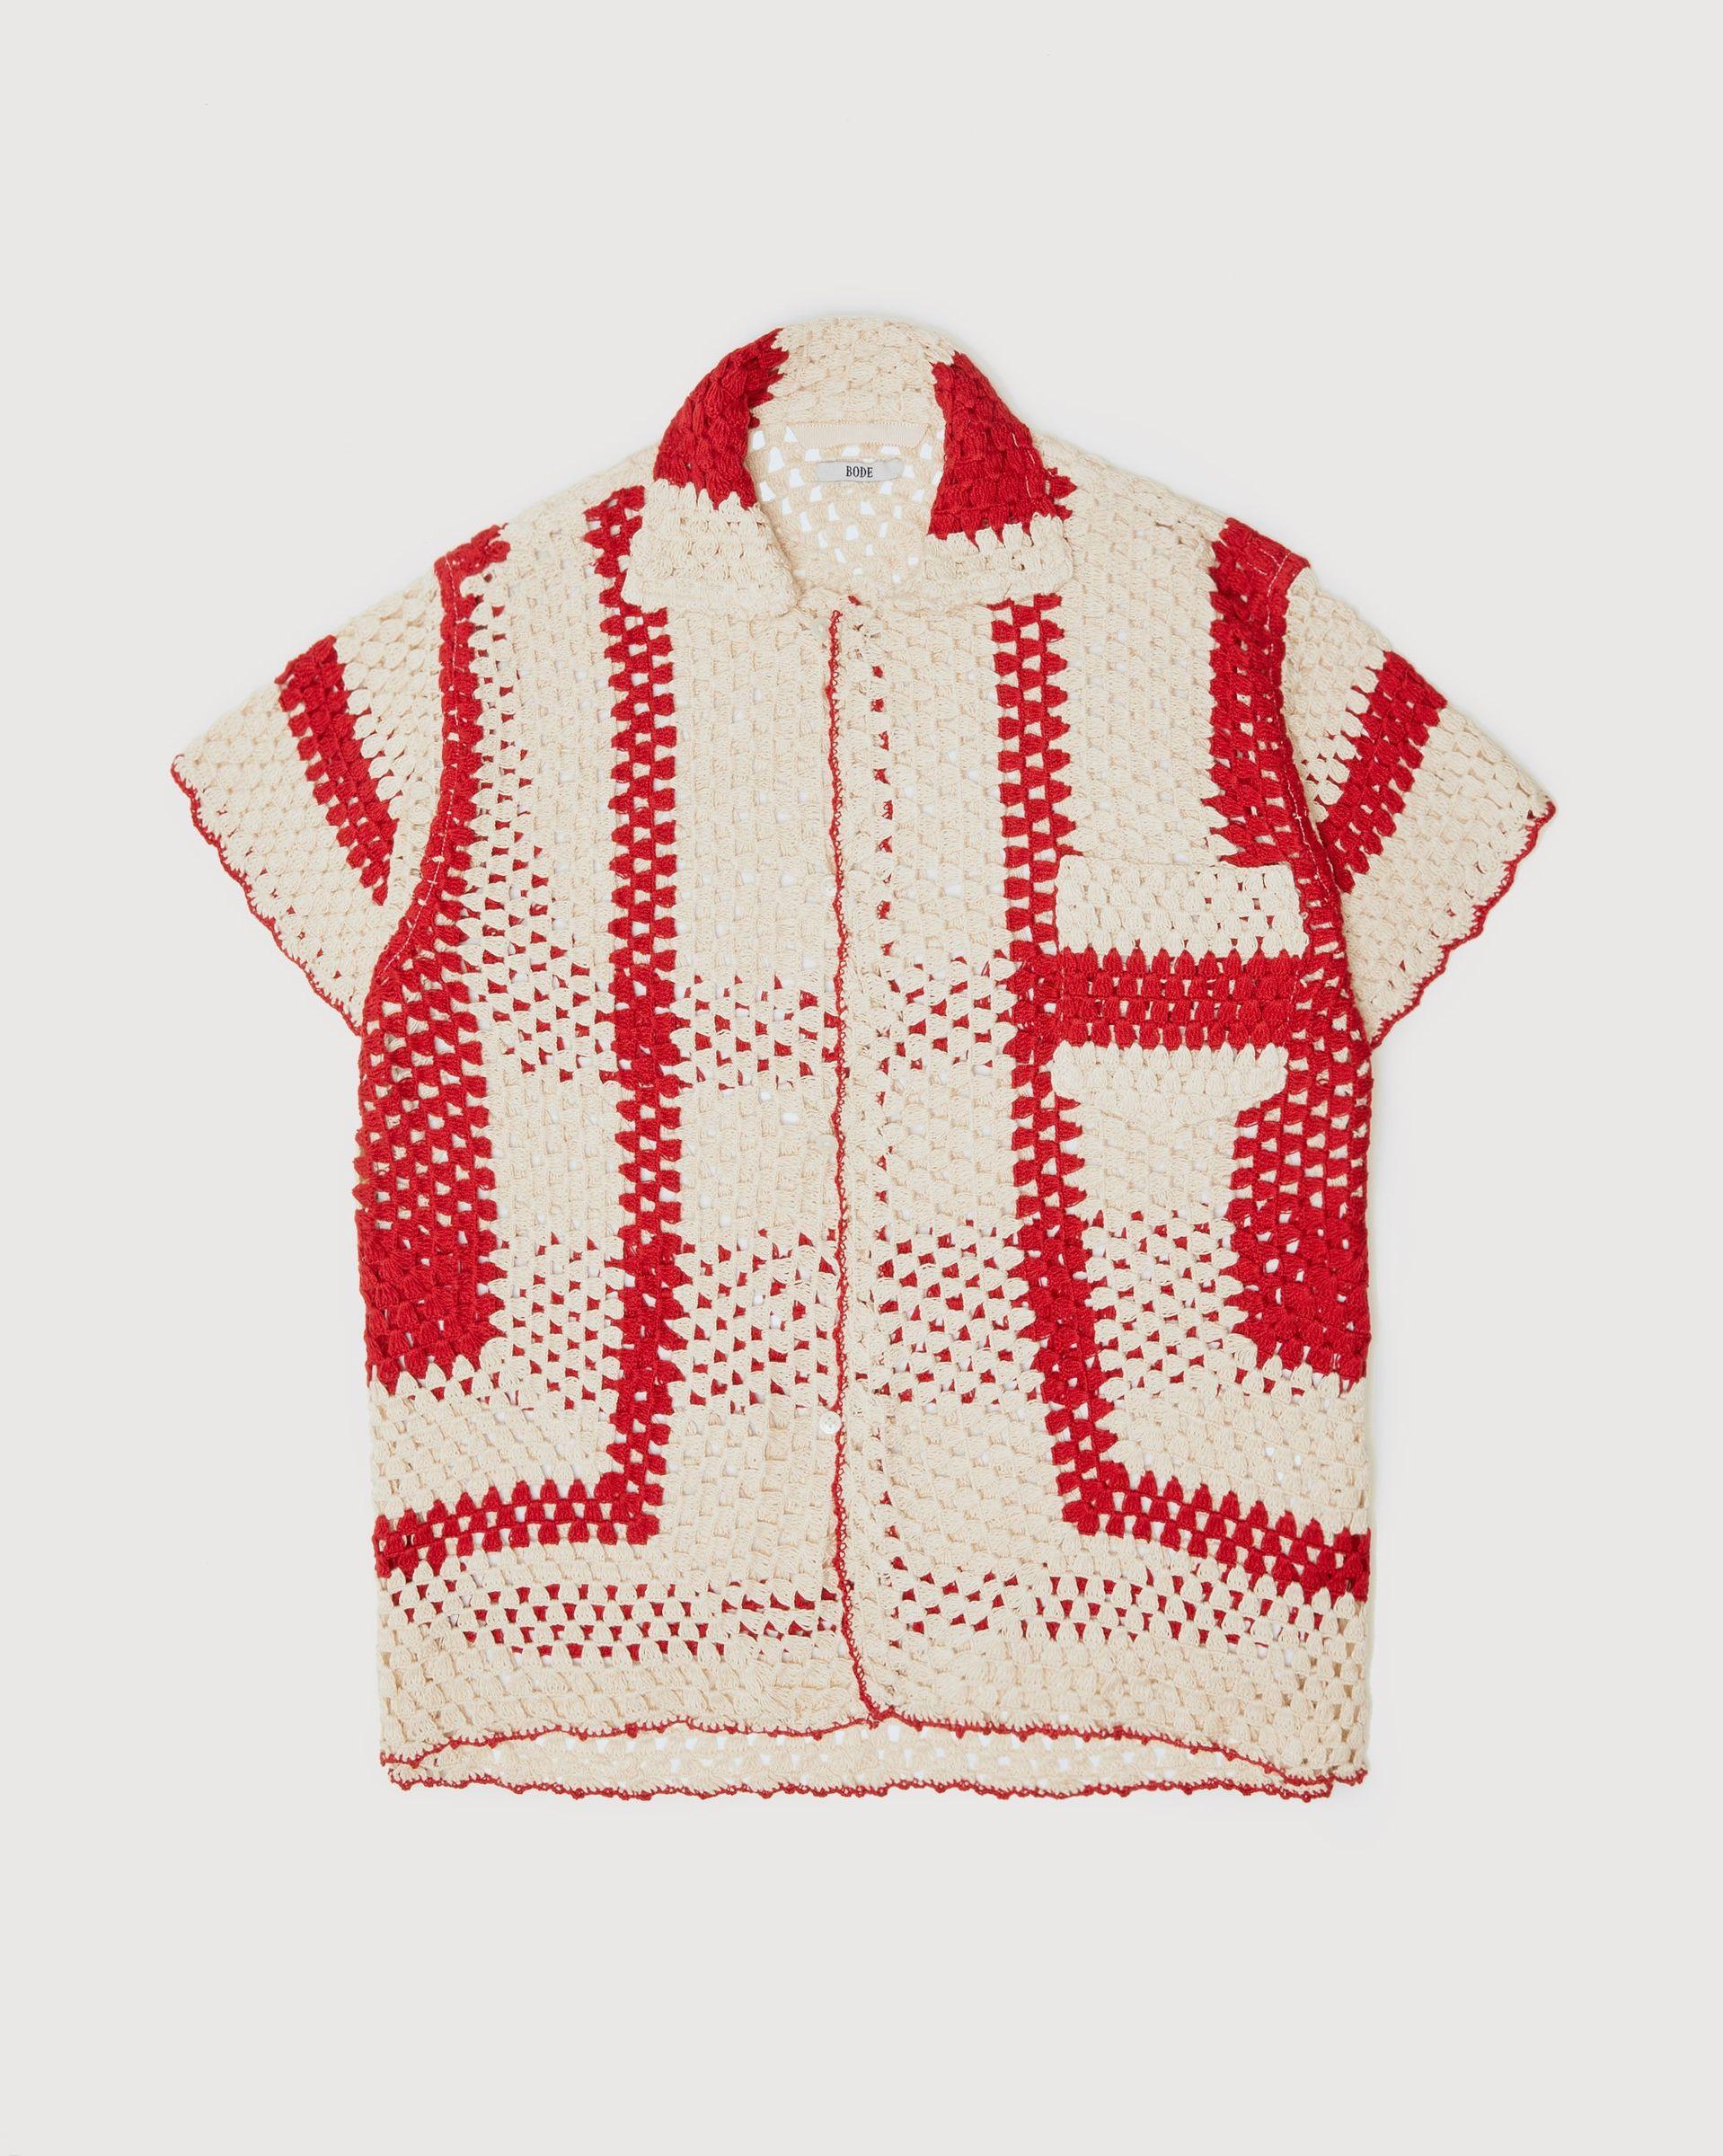 BODE - Crochet Big Top Shirt White Red - Image 1